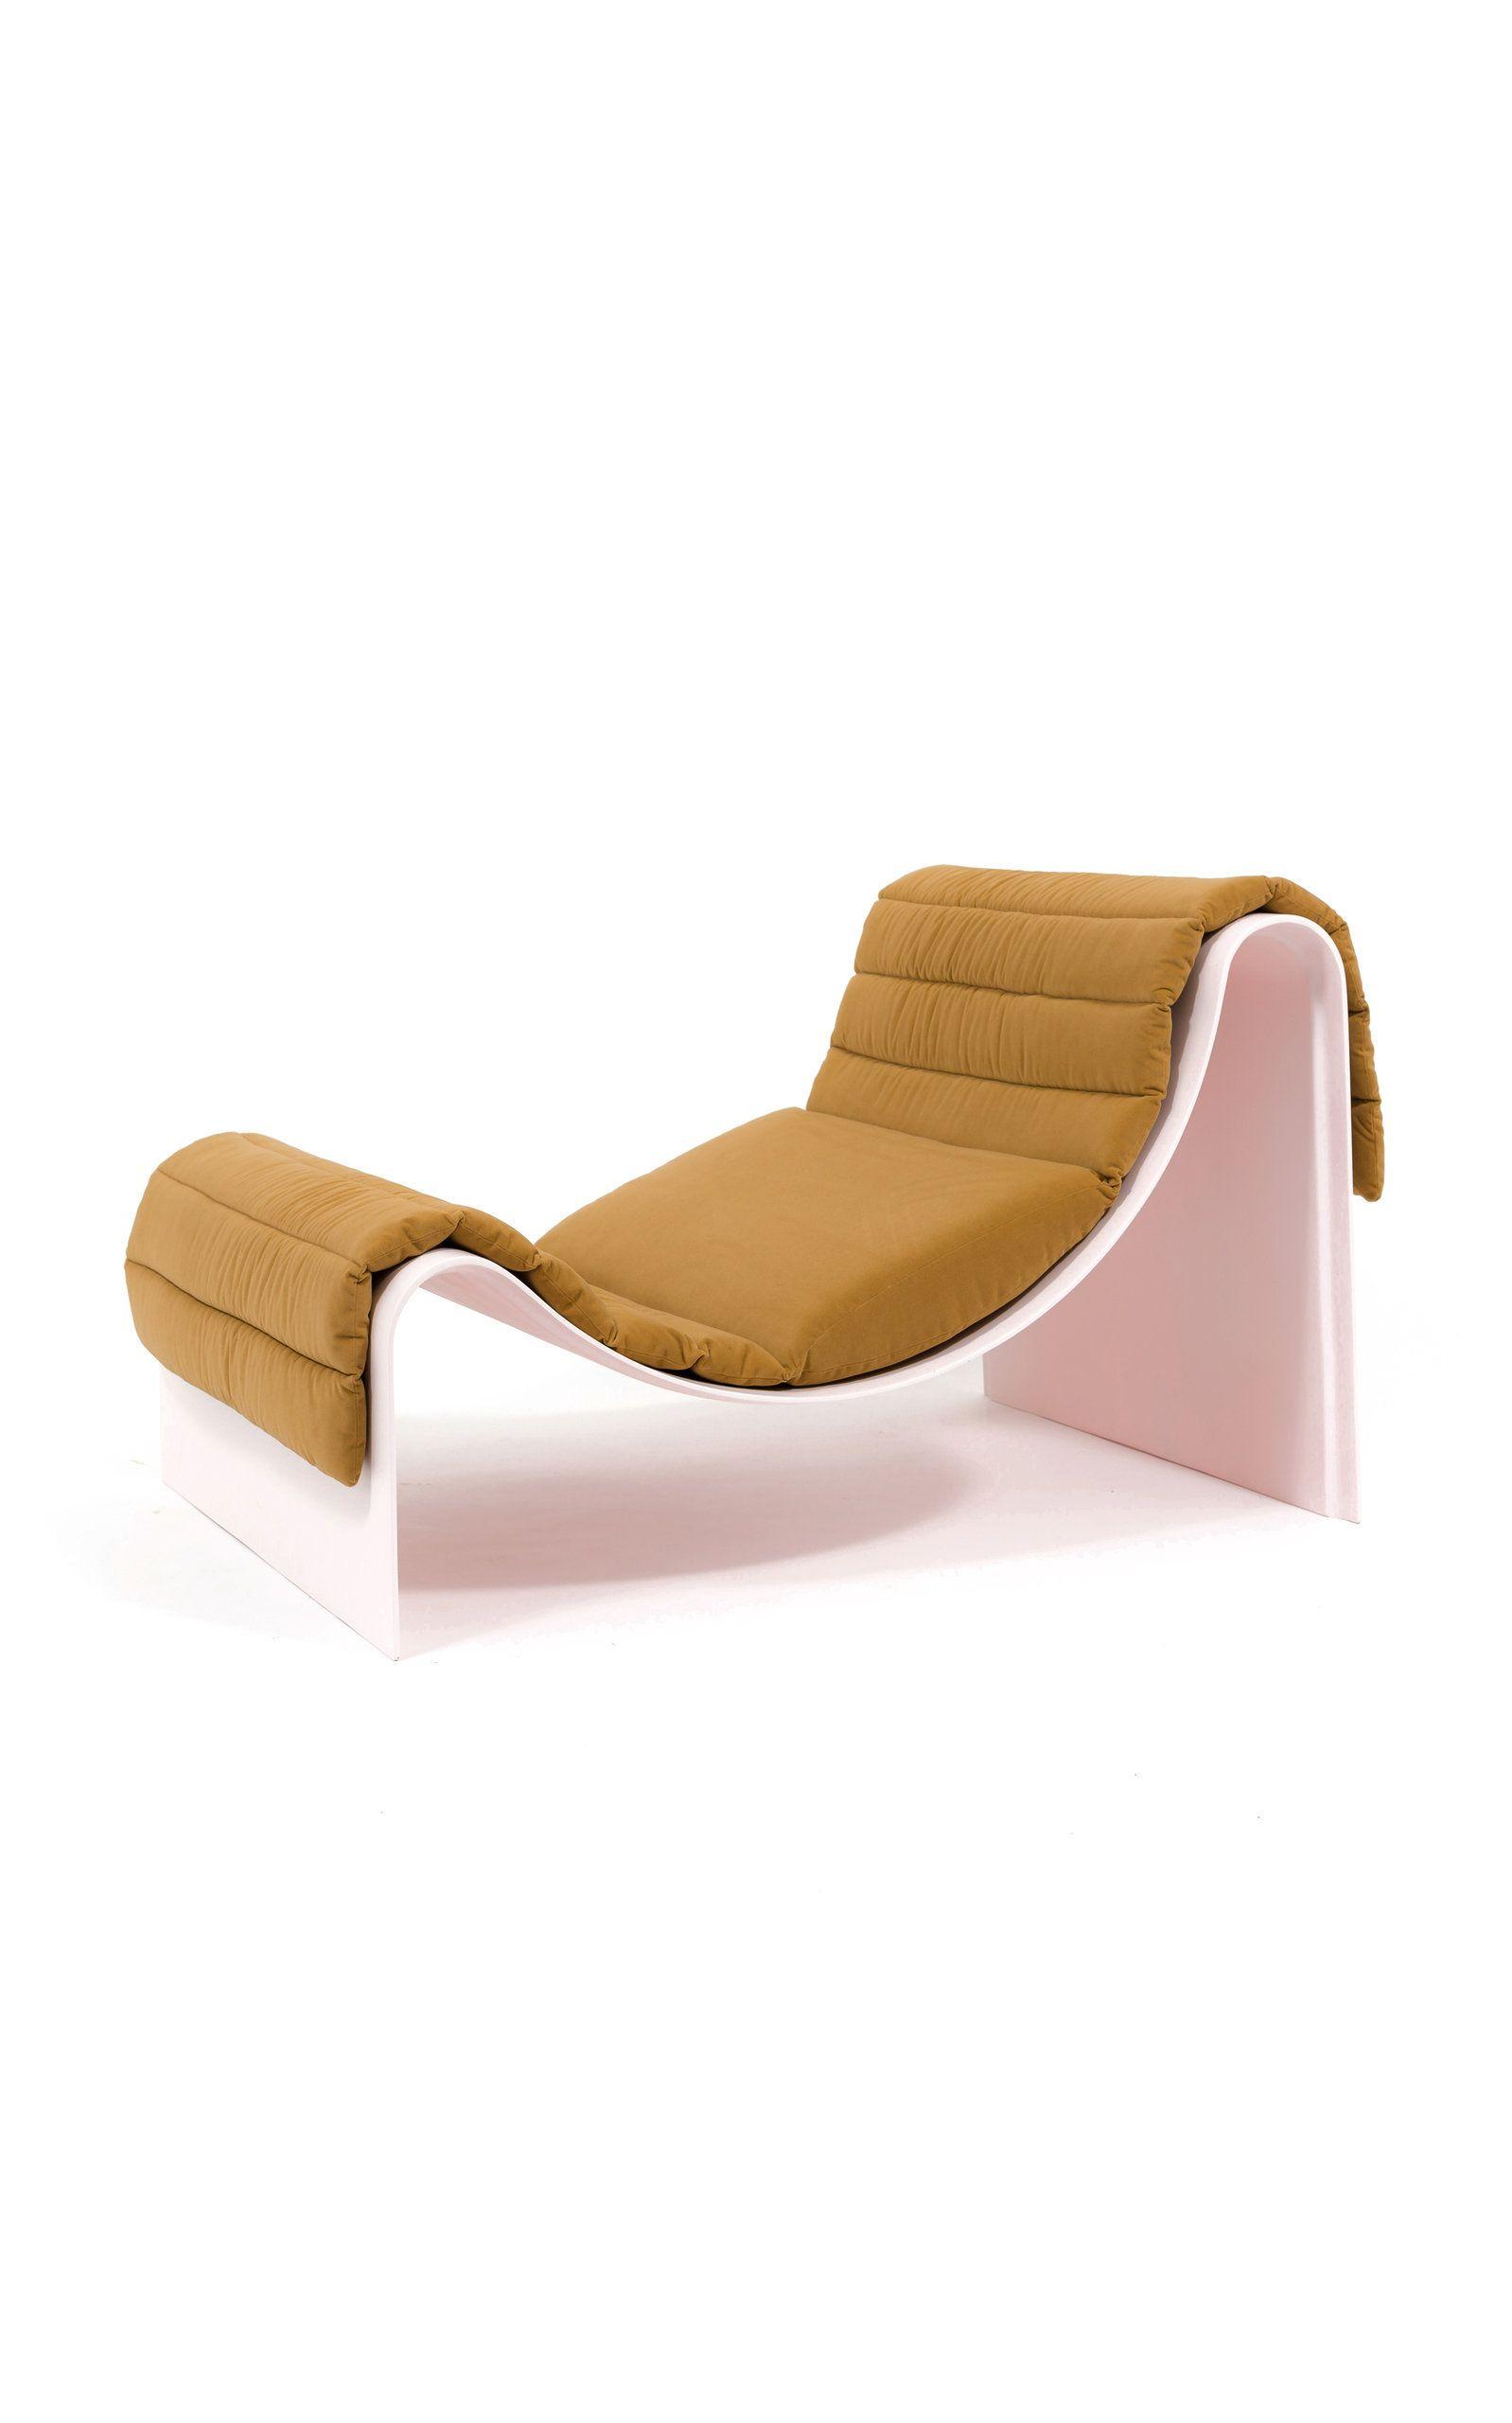 chaise longue slinky fly